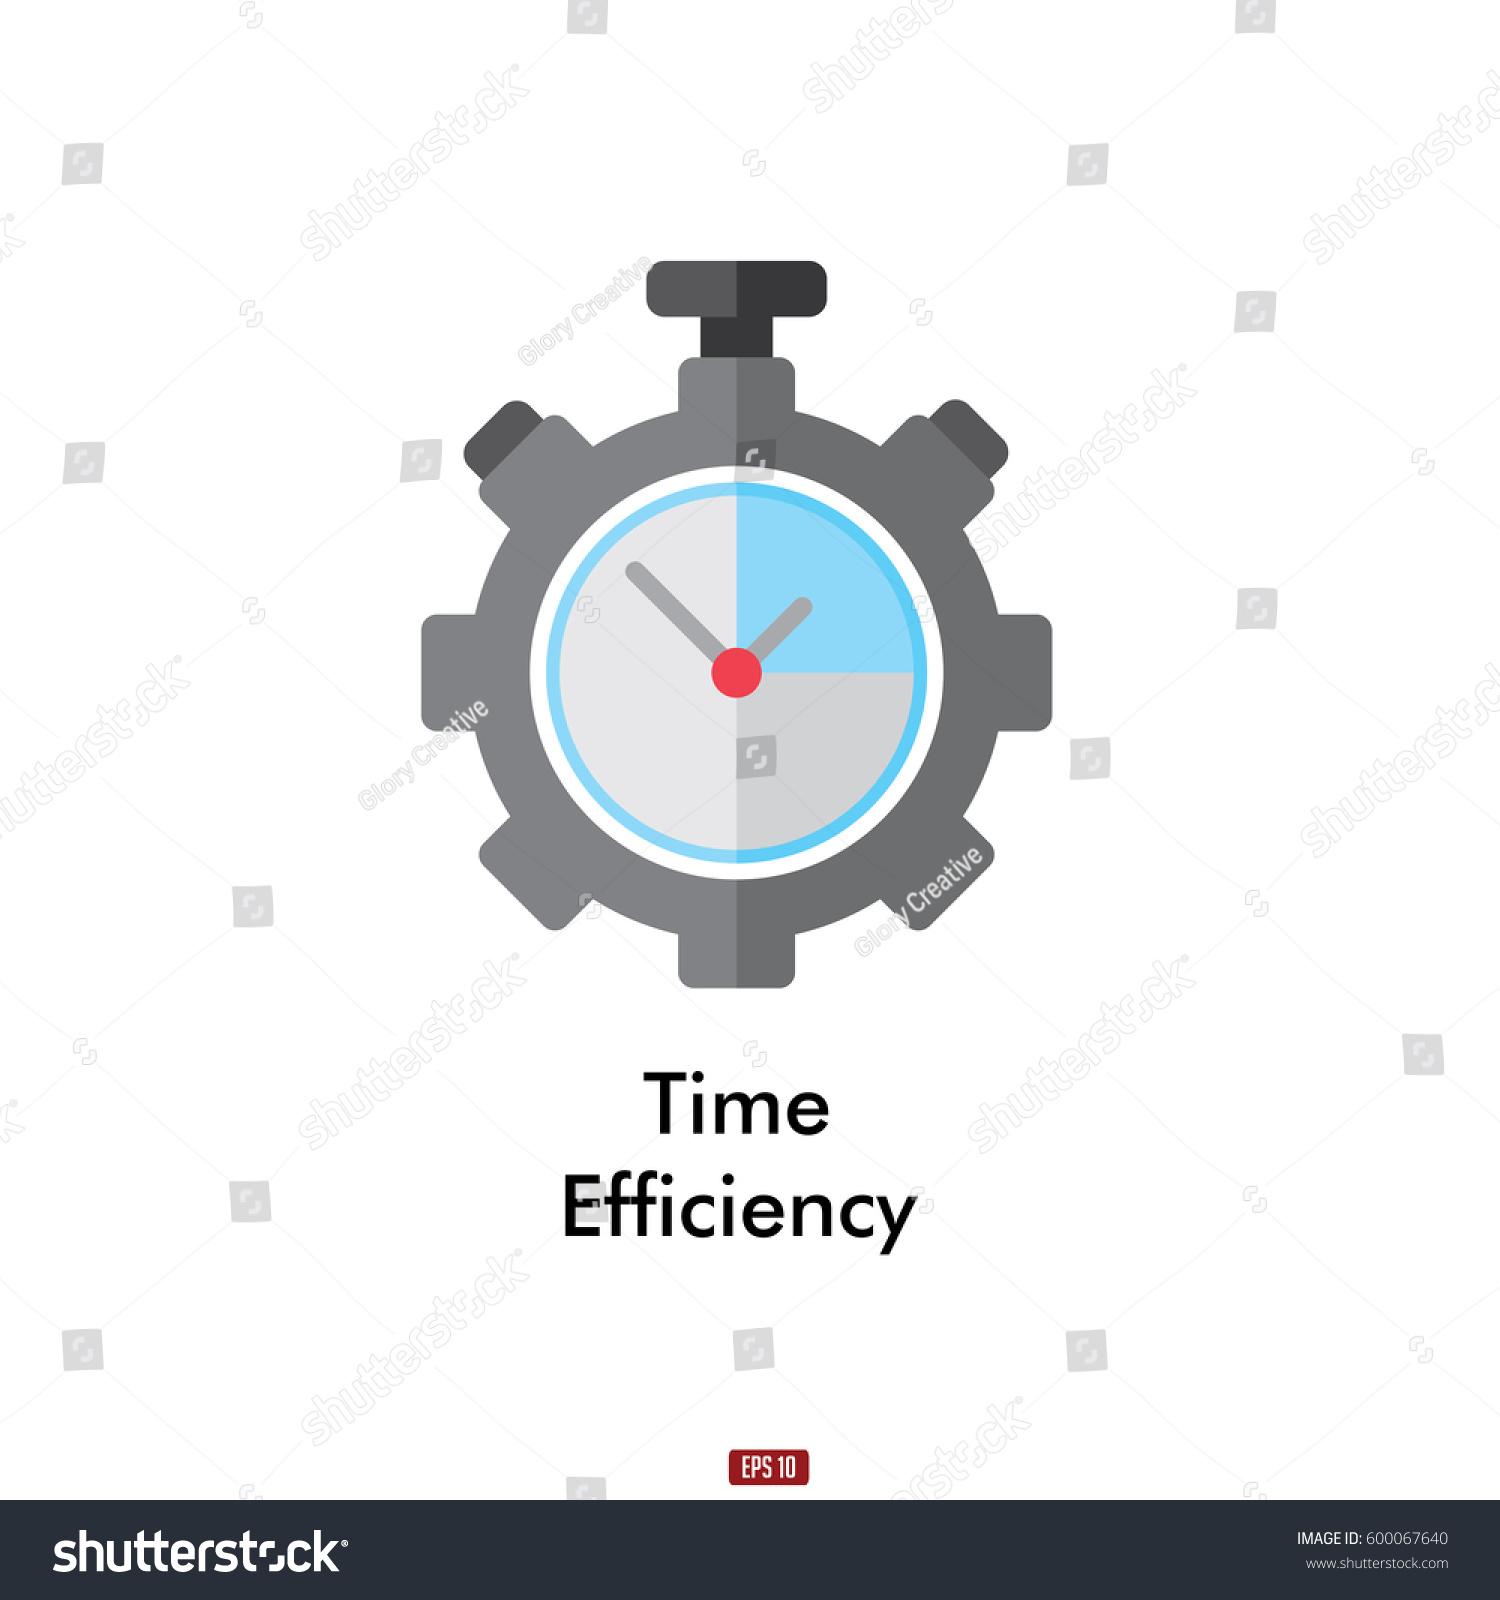 Time Efficiency Vector Icon Stock Vector 600067640 ...